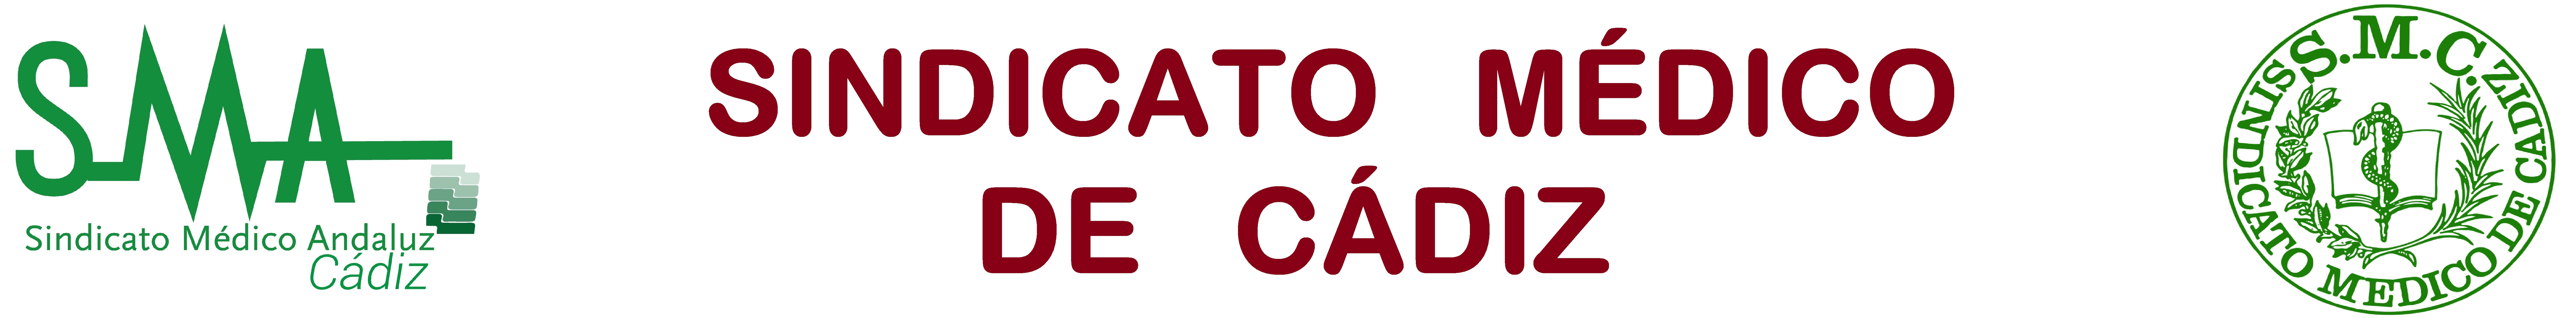 Sindicato Médico de Cádiz